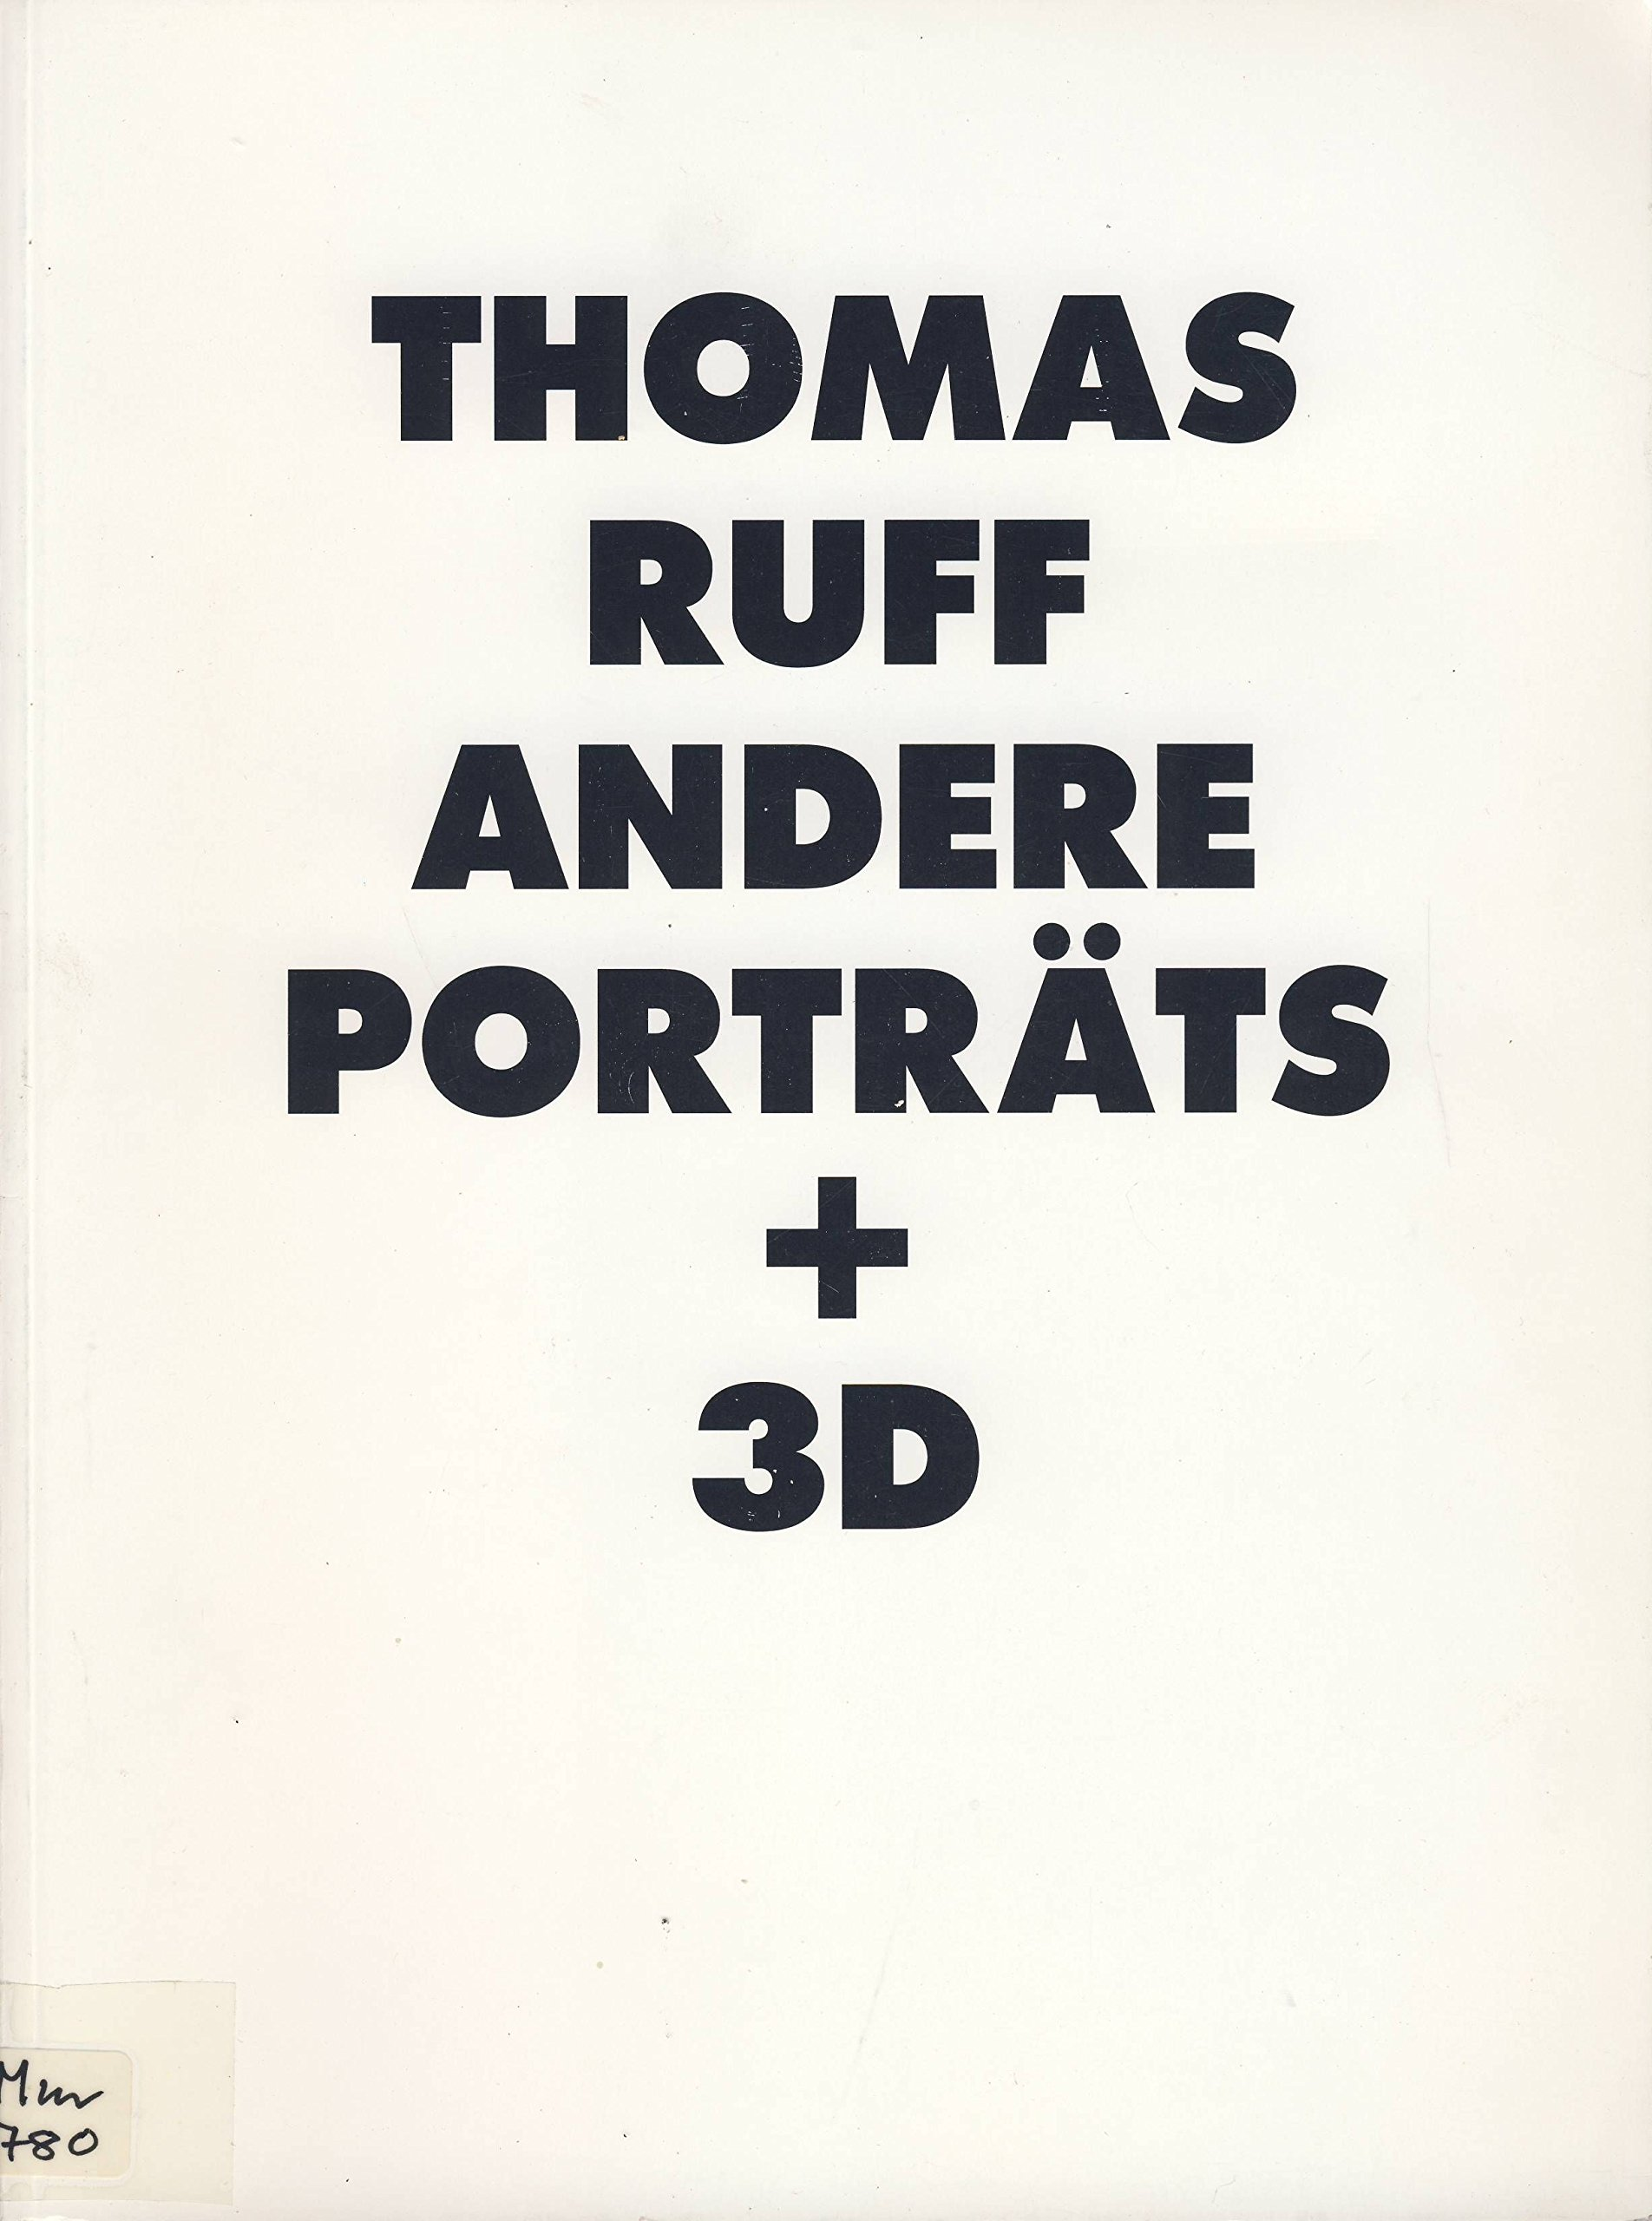 Thomas Ruff Andene Portraits (German Edition)